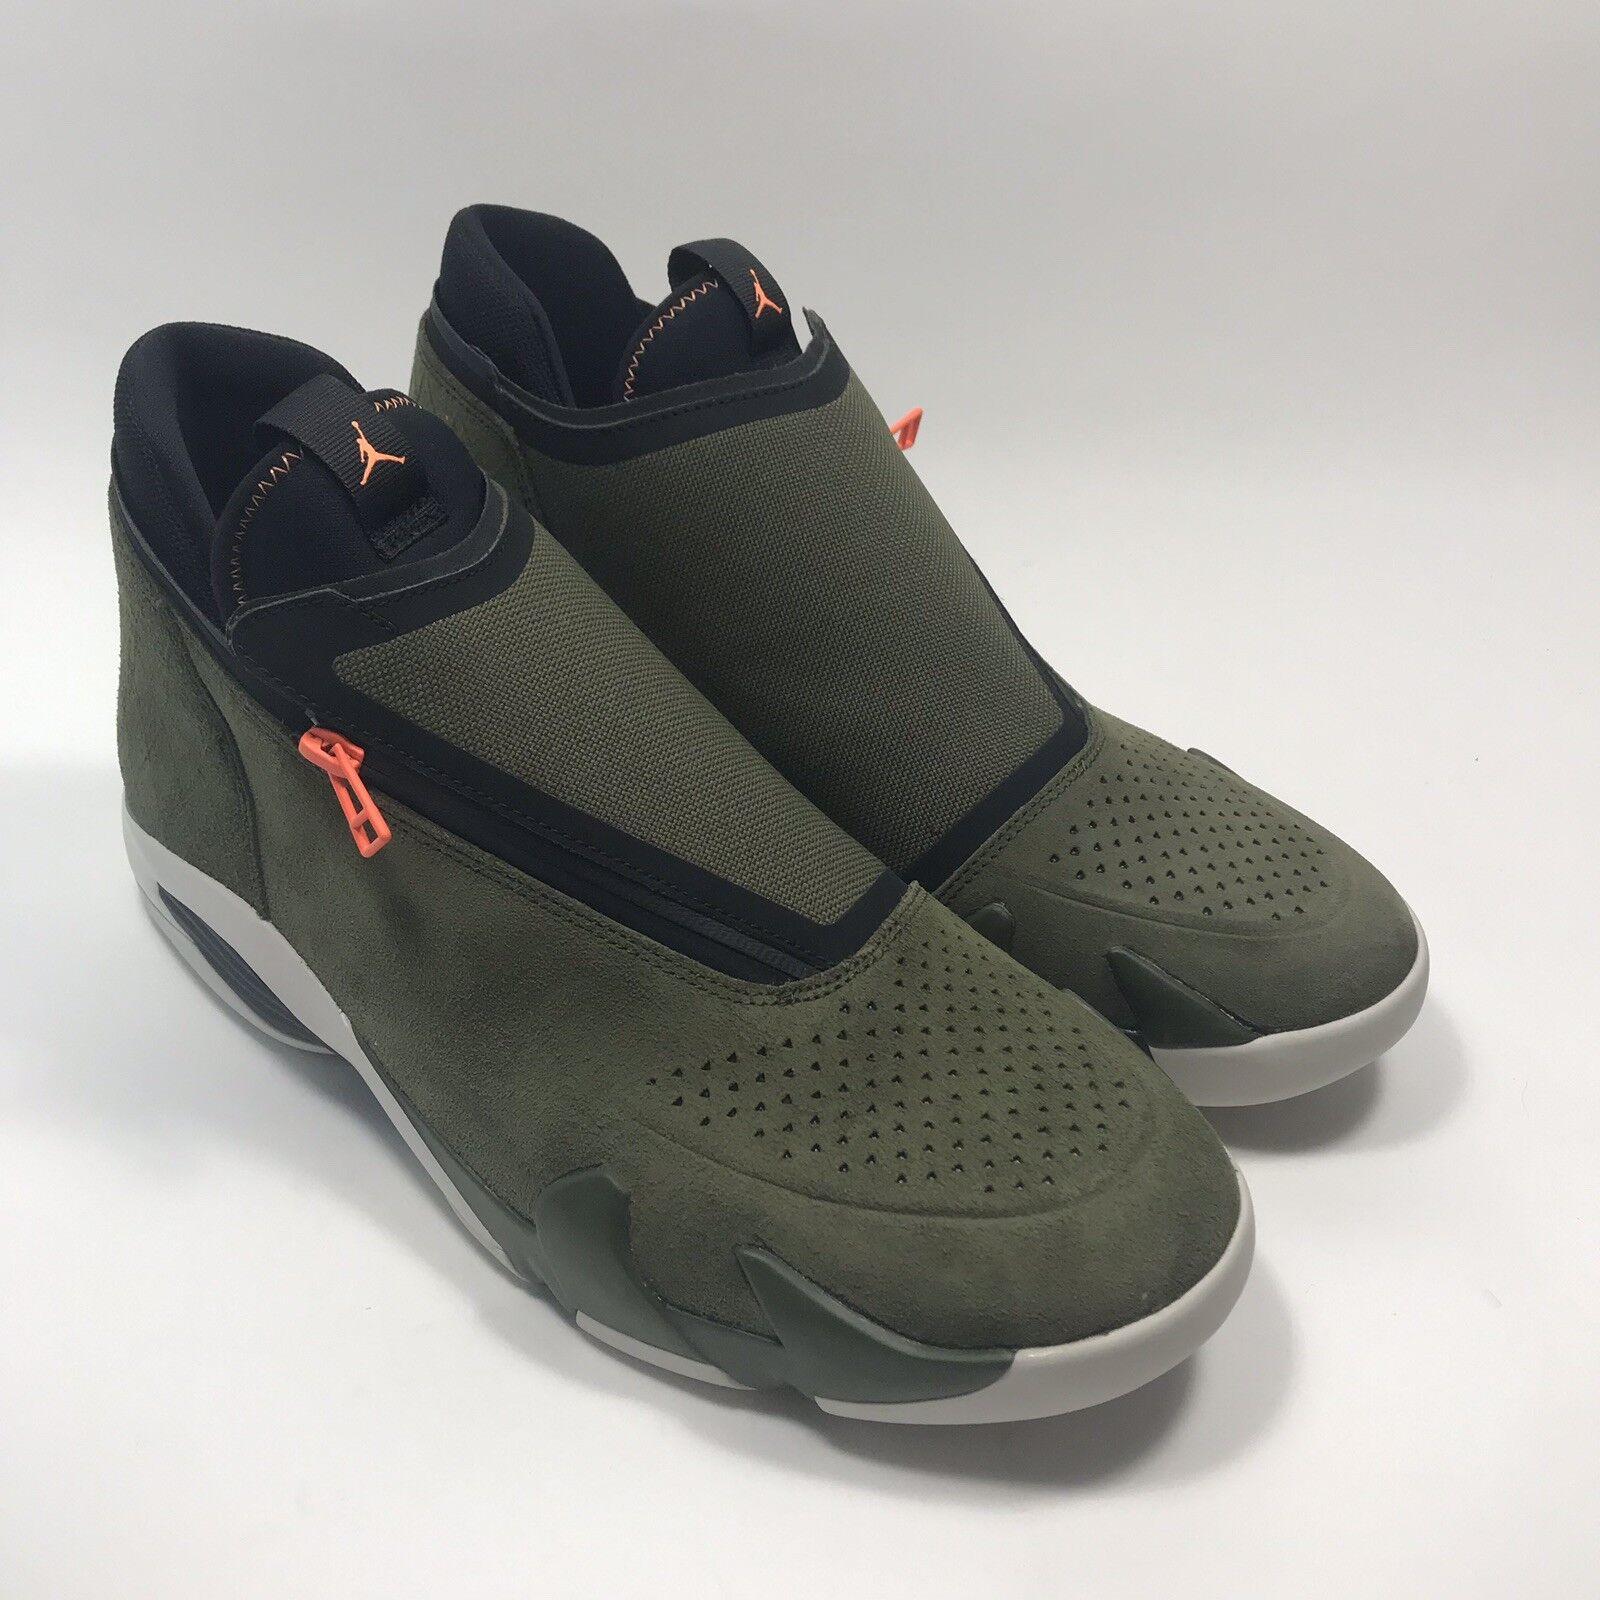 New Jordan Jumpman Z Canvas Cone Basketball shoes Size 11.5 Mens AQ9119-300